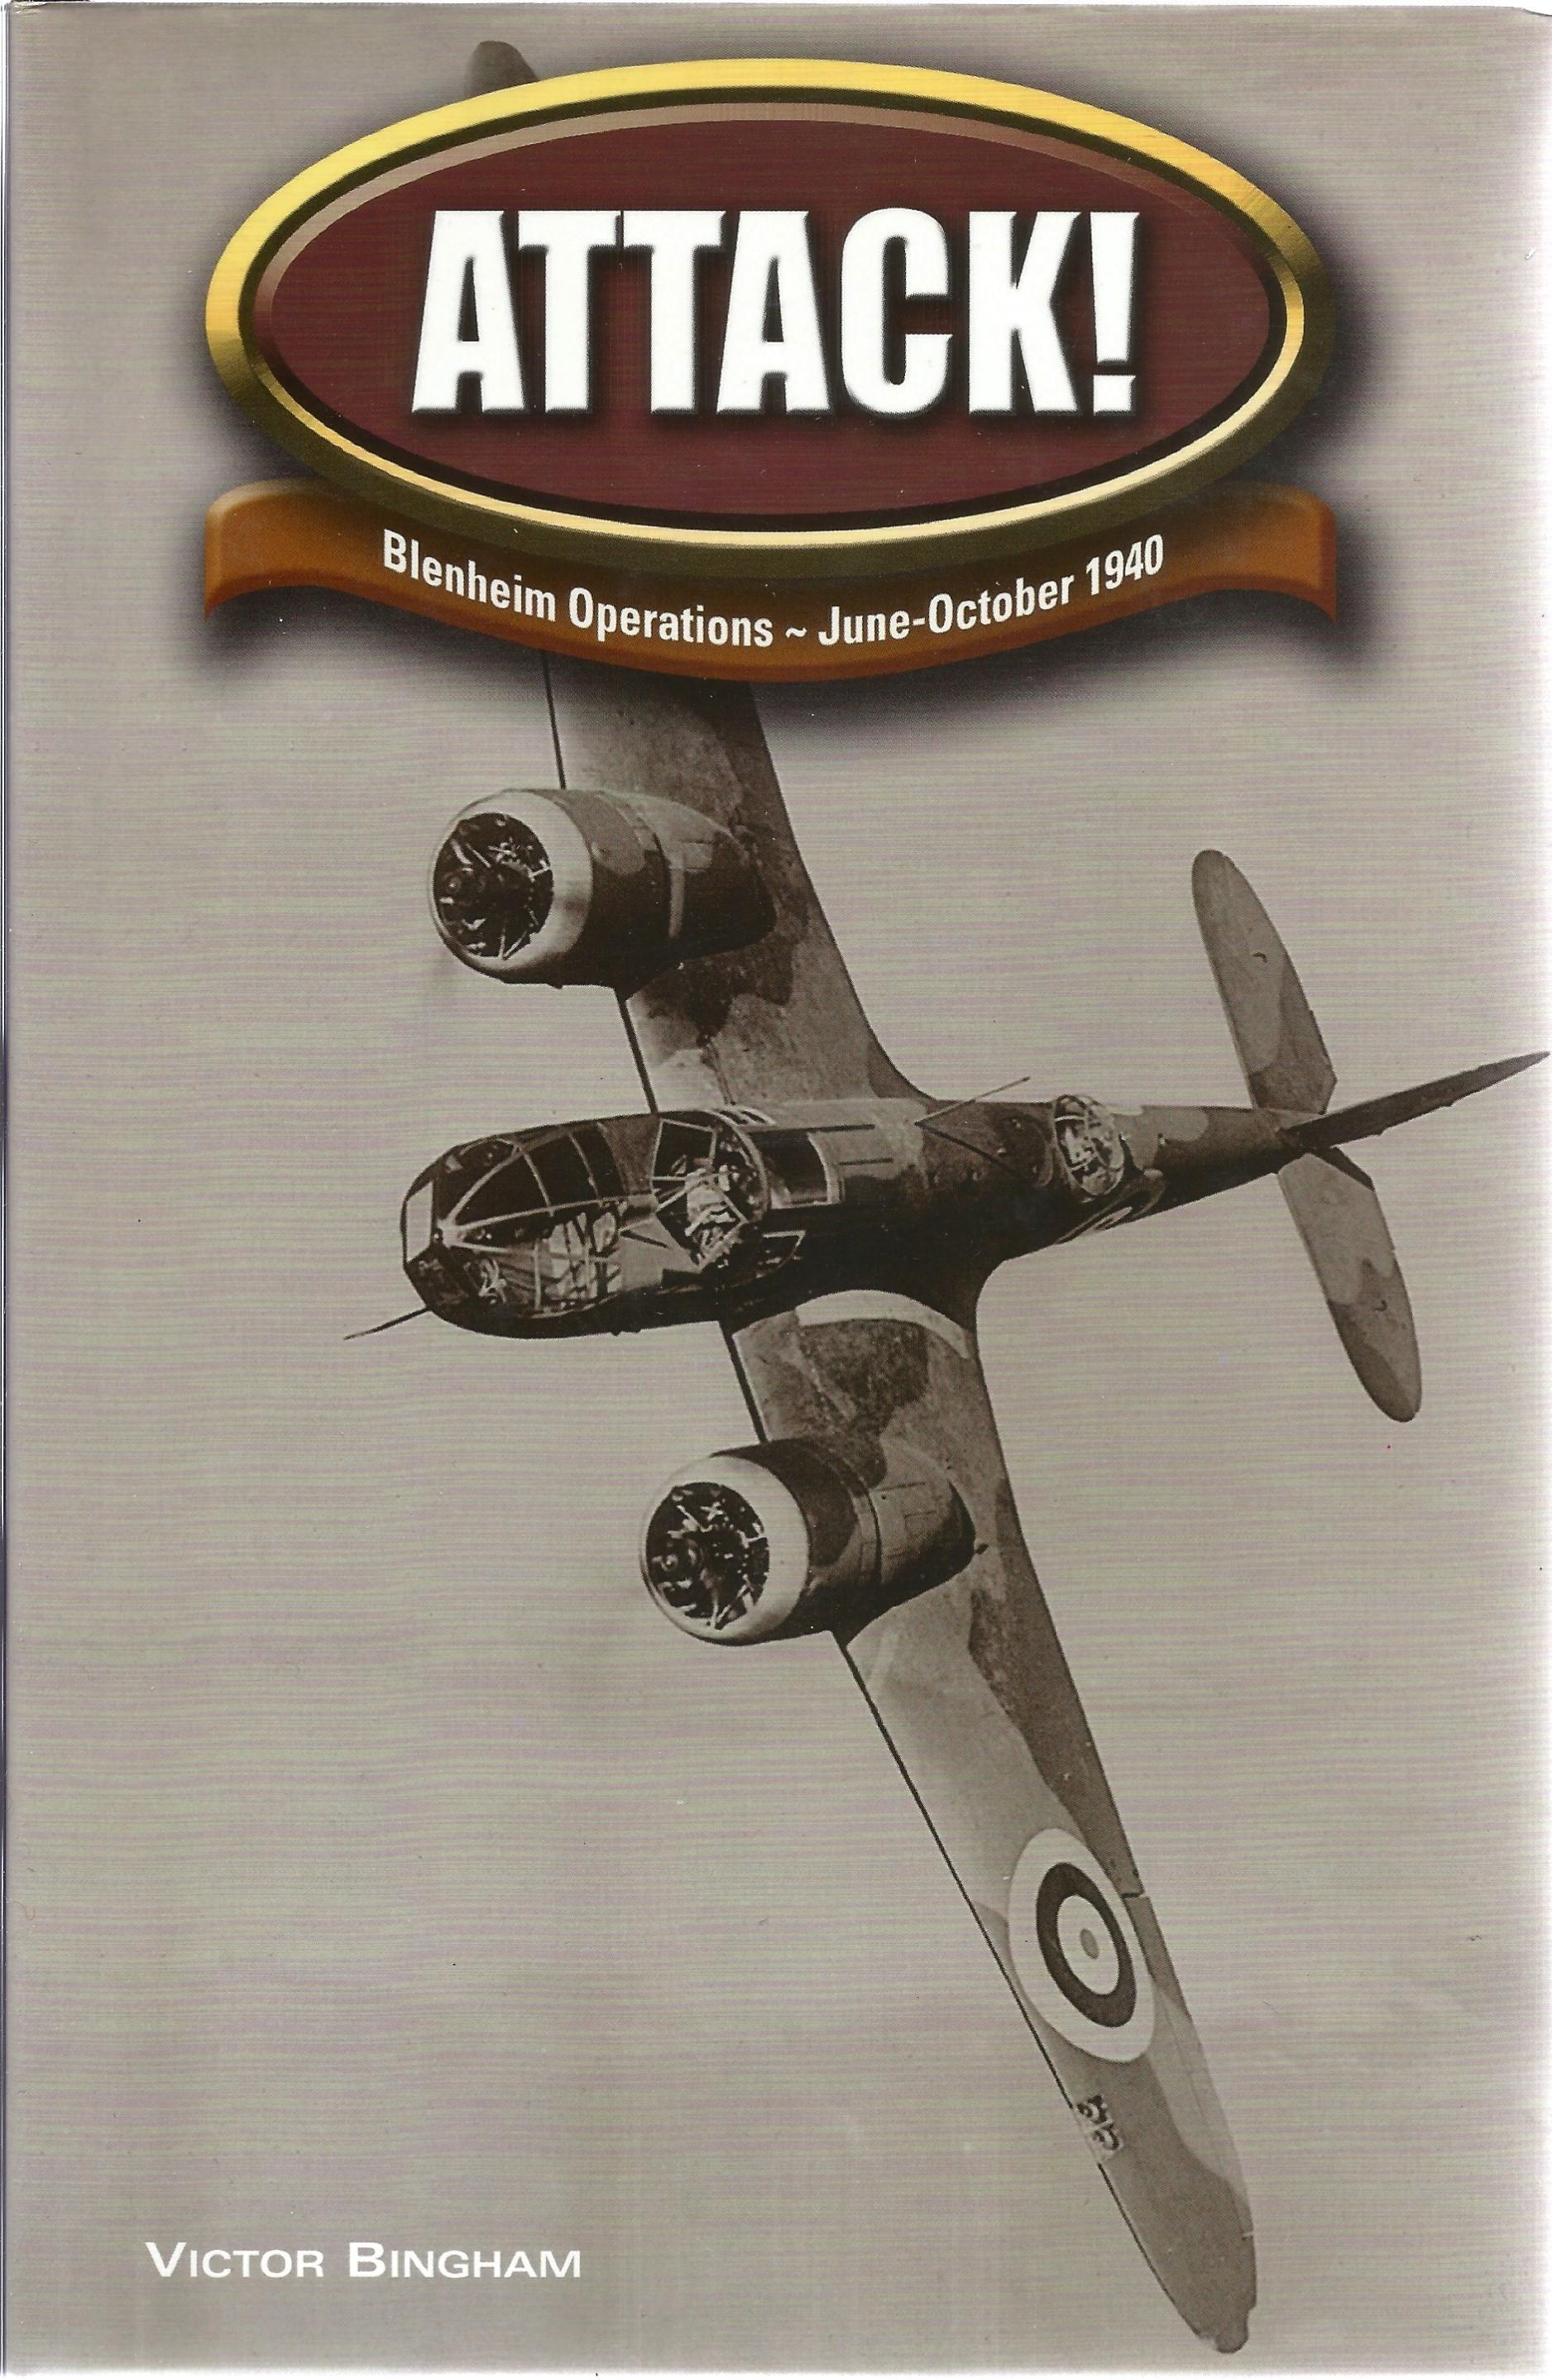 Victor Bingham. Attack! Blenheim Operations June October 1940. A WW2 First edition hardback book